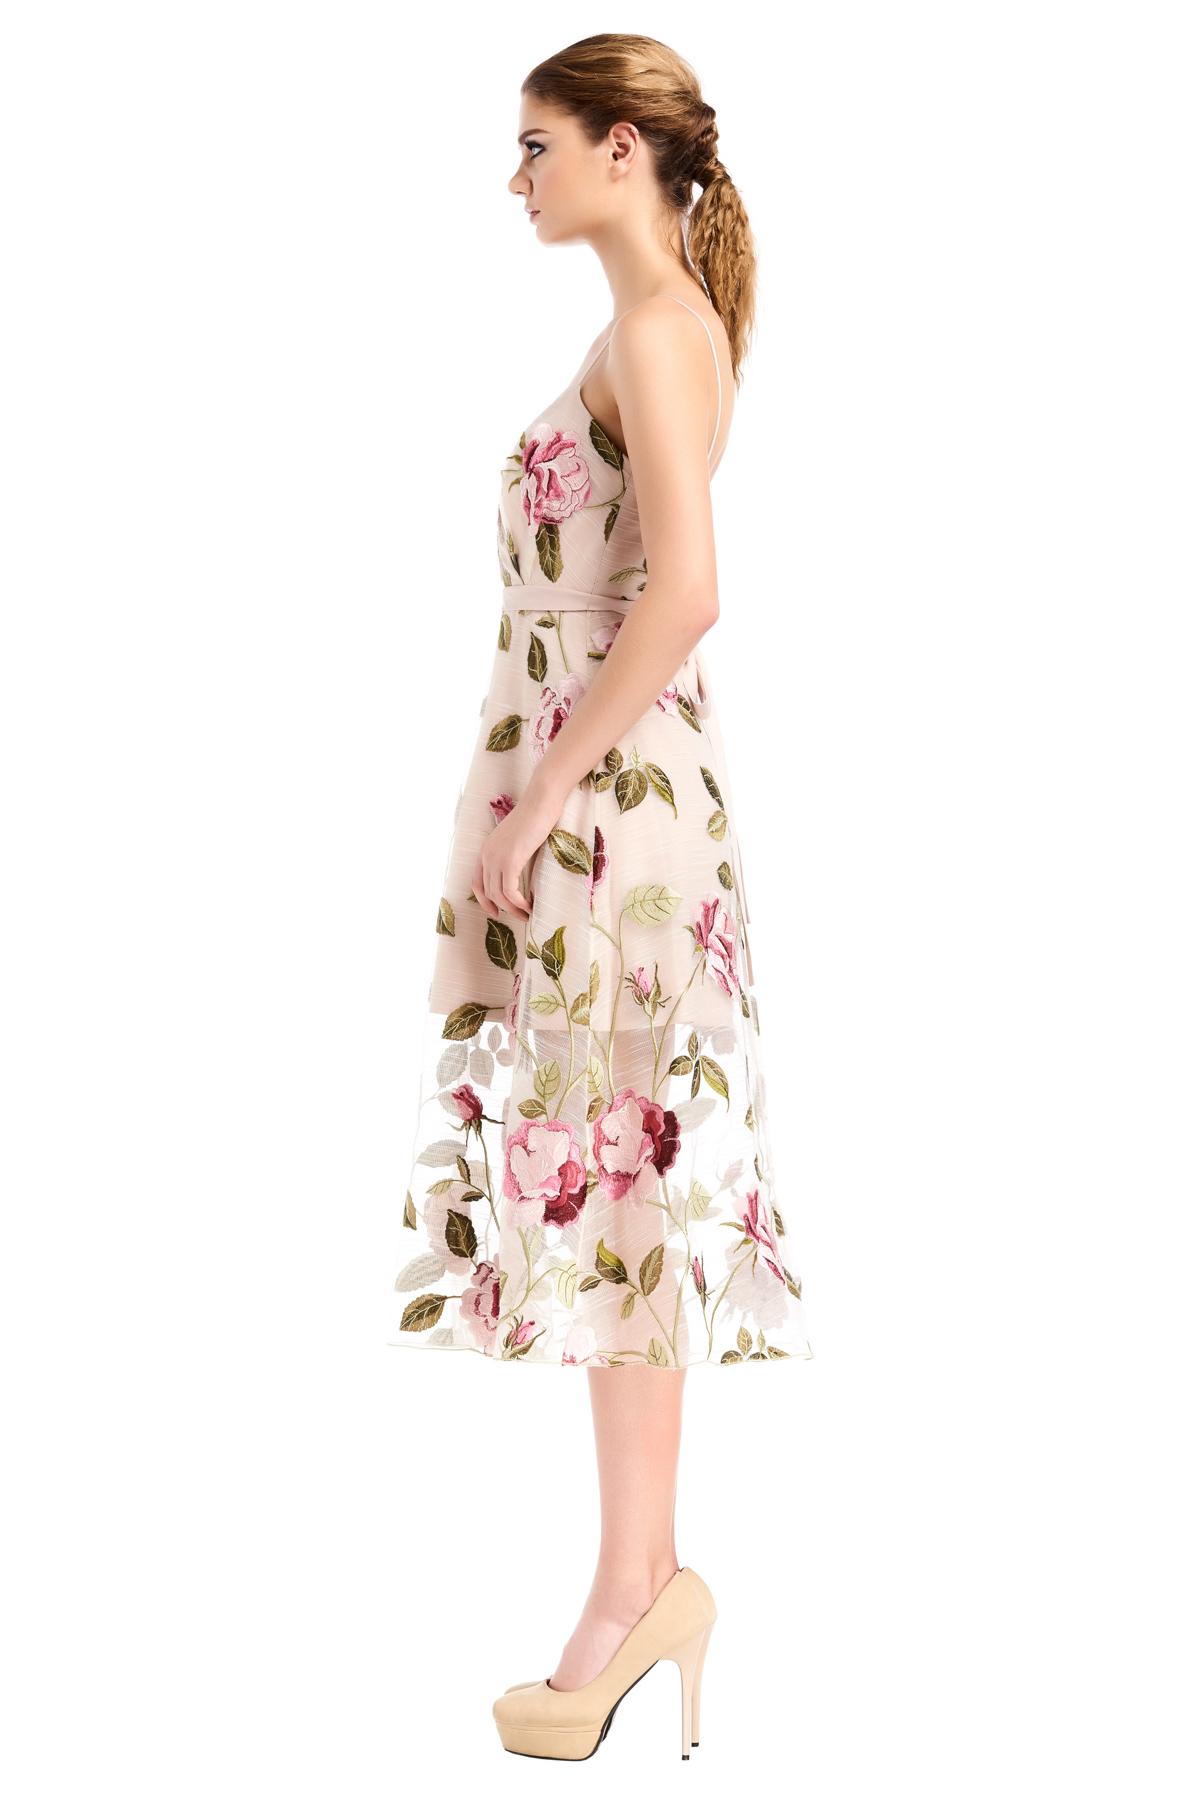 WEE Brand, dress, floral dress, print dress, creme dress, long dress. party dress, designer dress, outfit, fashion, ชุดแบรนด์เนม, เช่าชุด, เดรส, เดรสยาว, ชุดออกงาน, ชุดปาร์ตี้